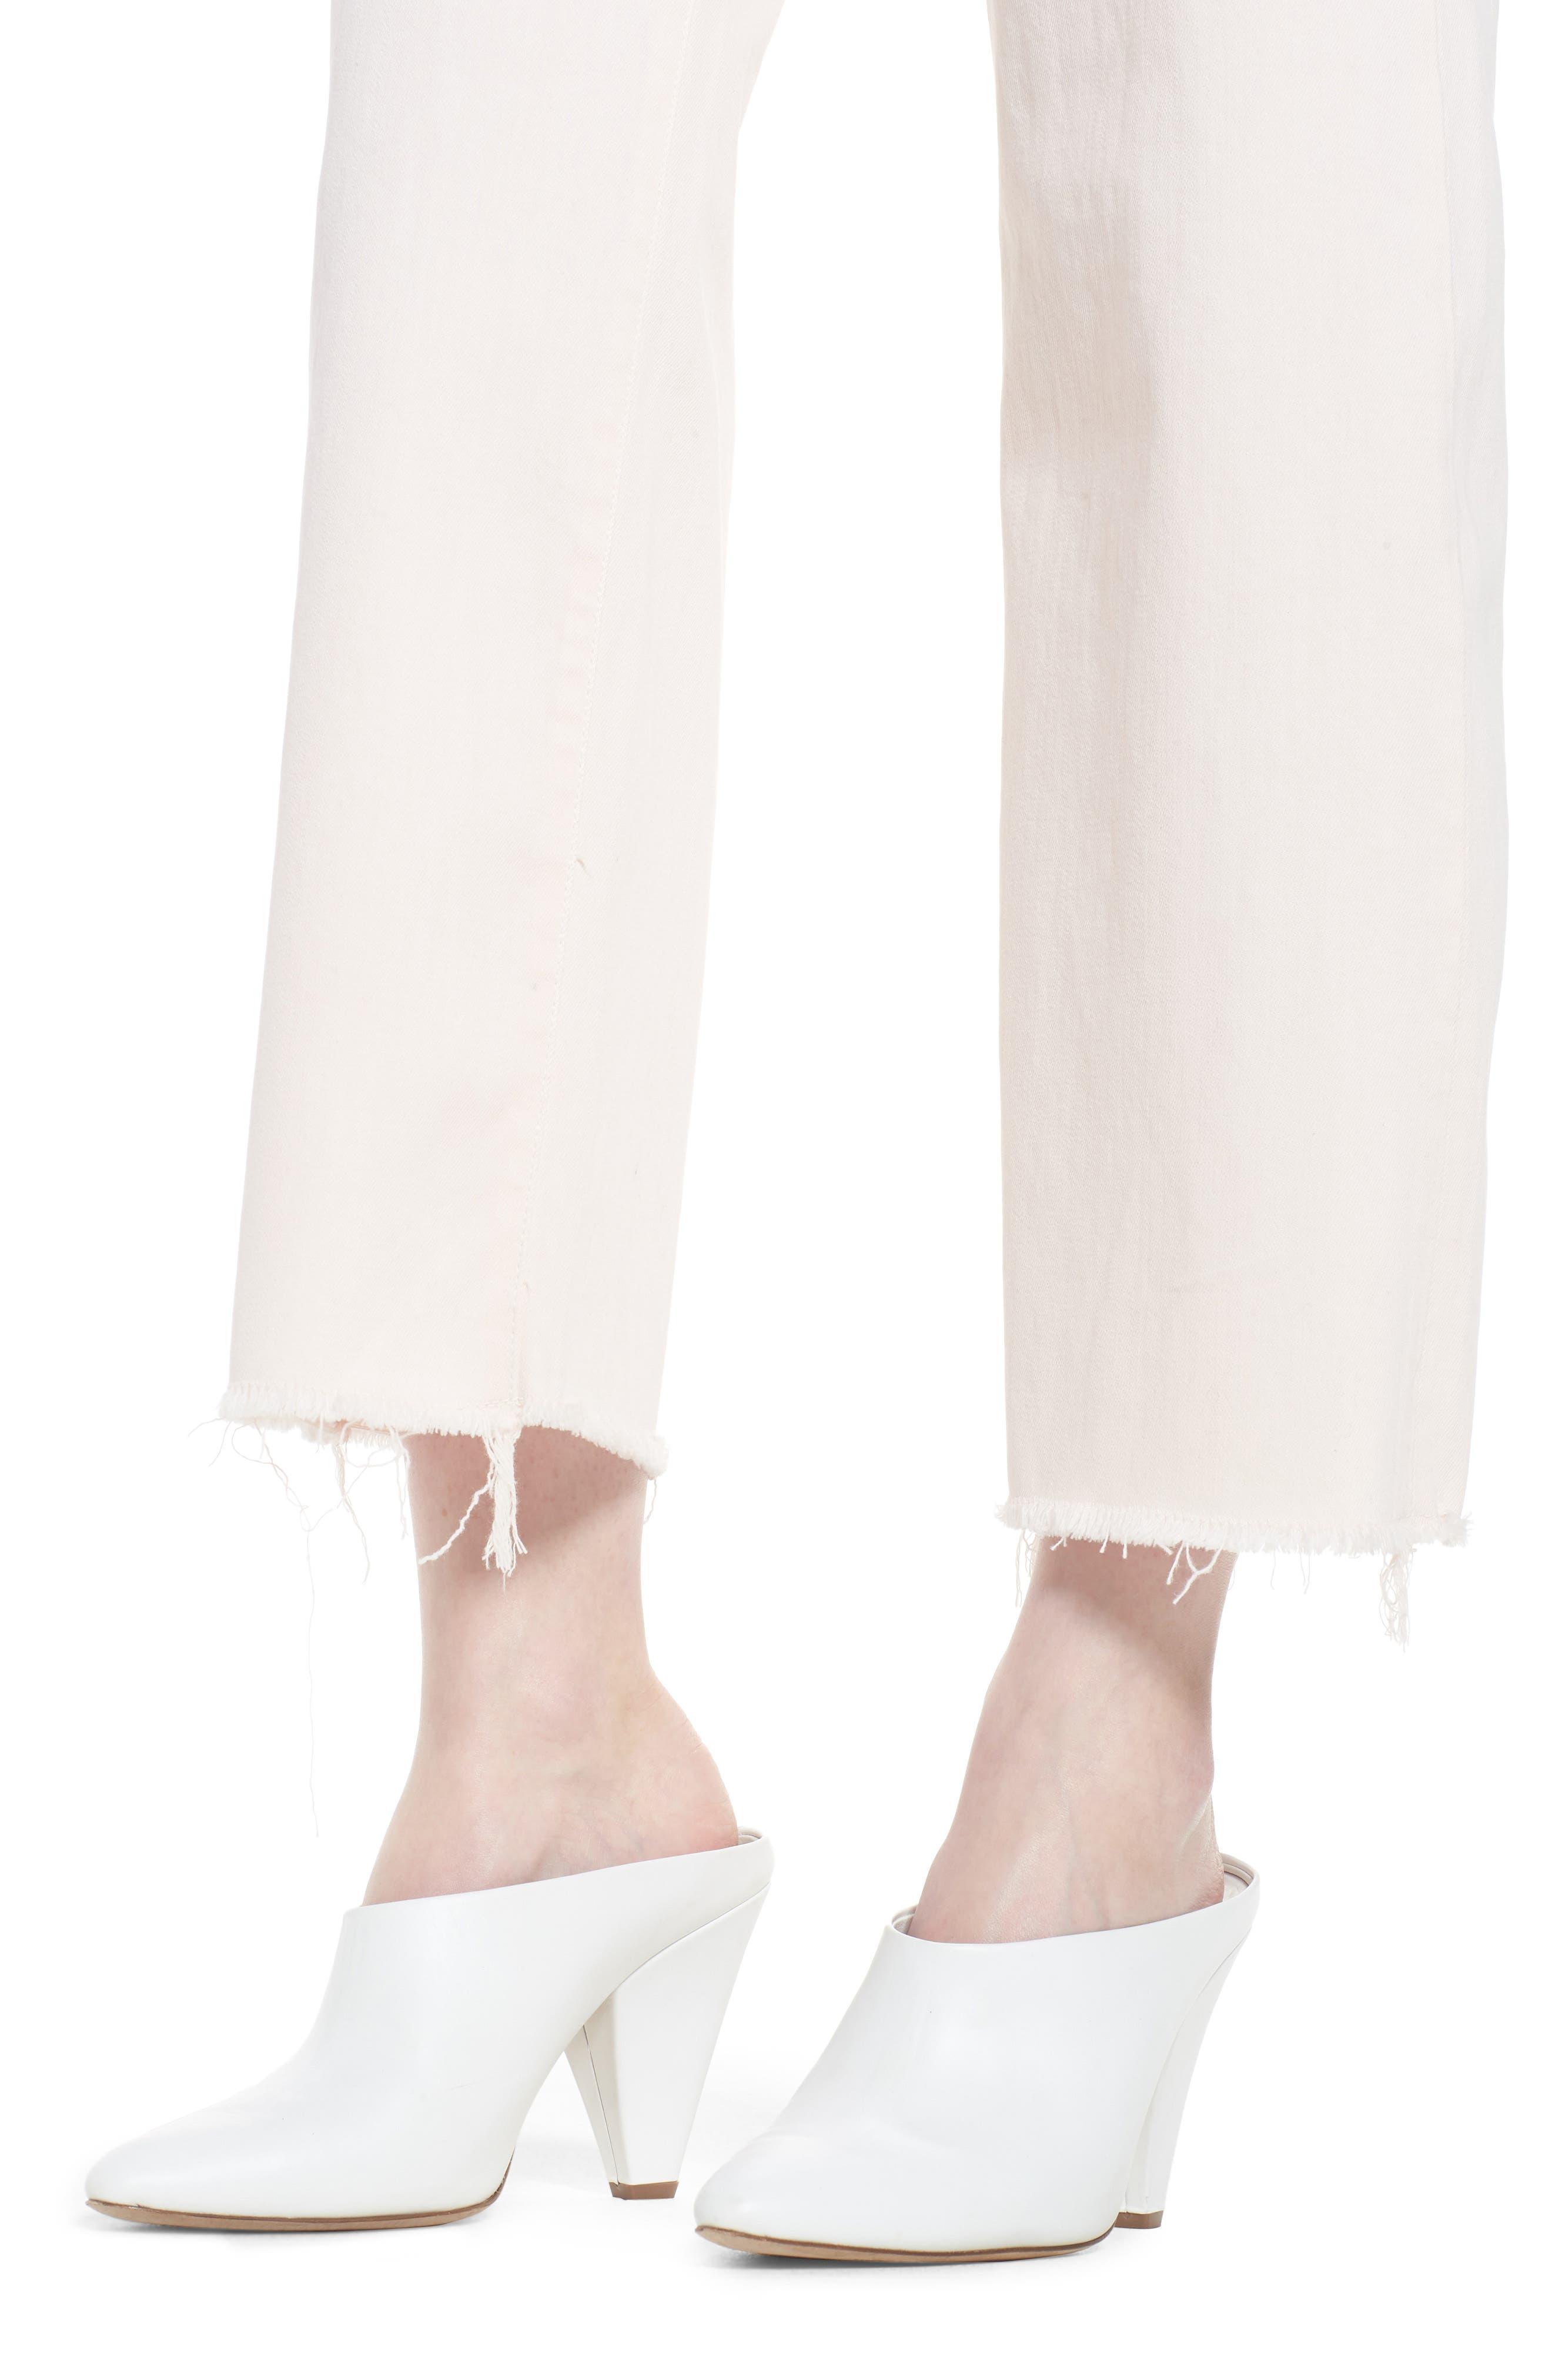 Hepburn Ankle Wide Leg Jeans,                             Alternate thumbnail 4, color,                             Blush Pink